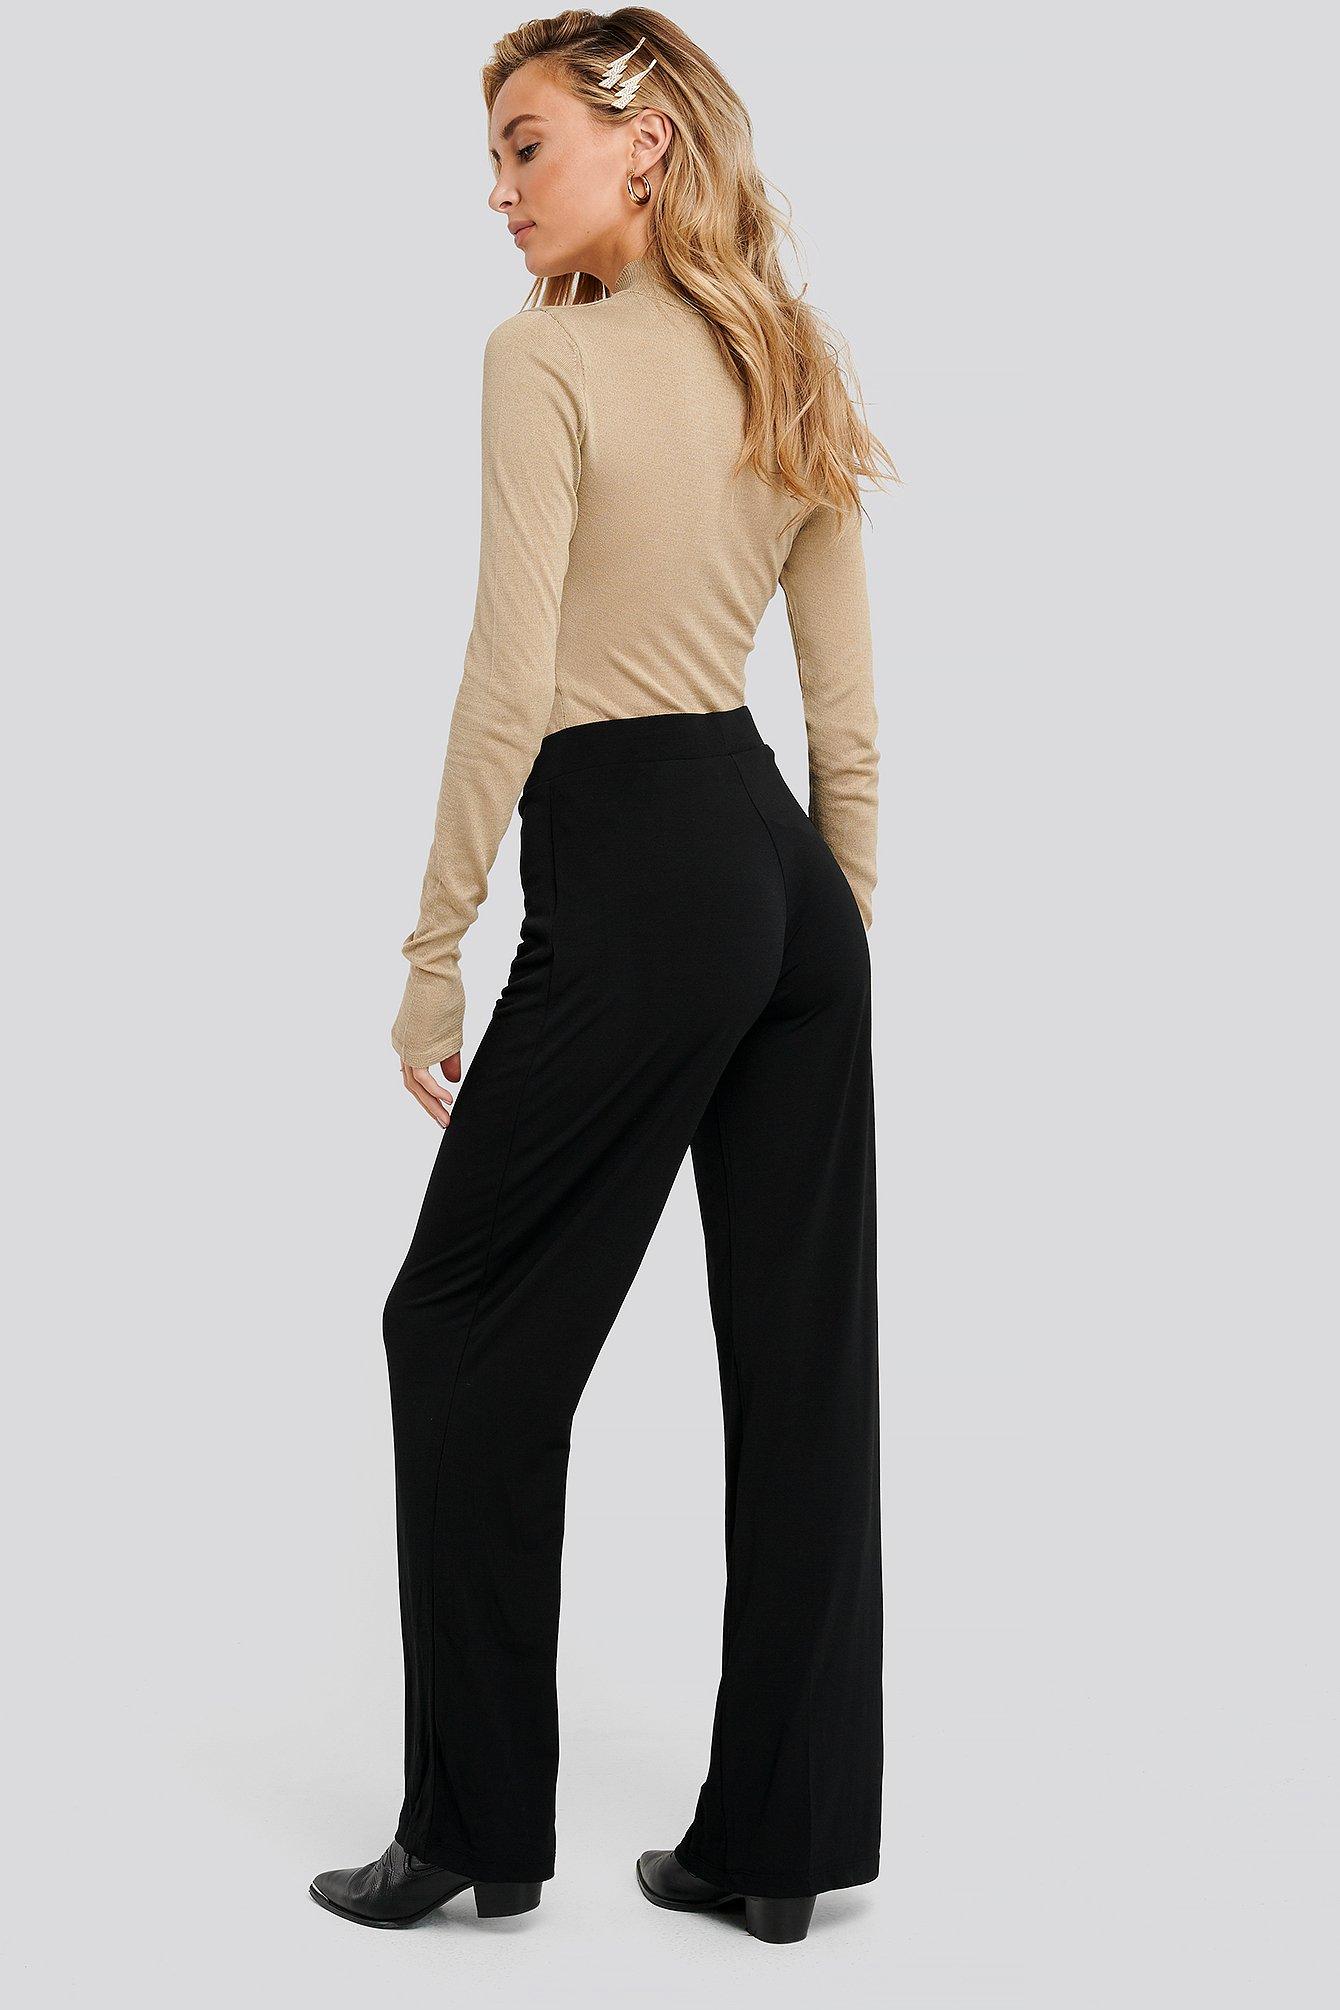 sisters point -  Gro Pants - Black